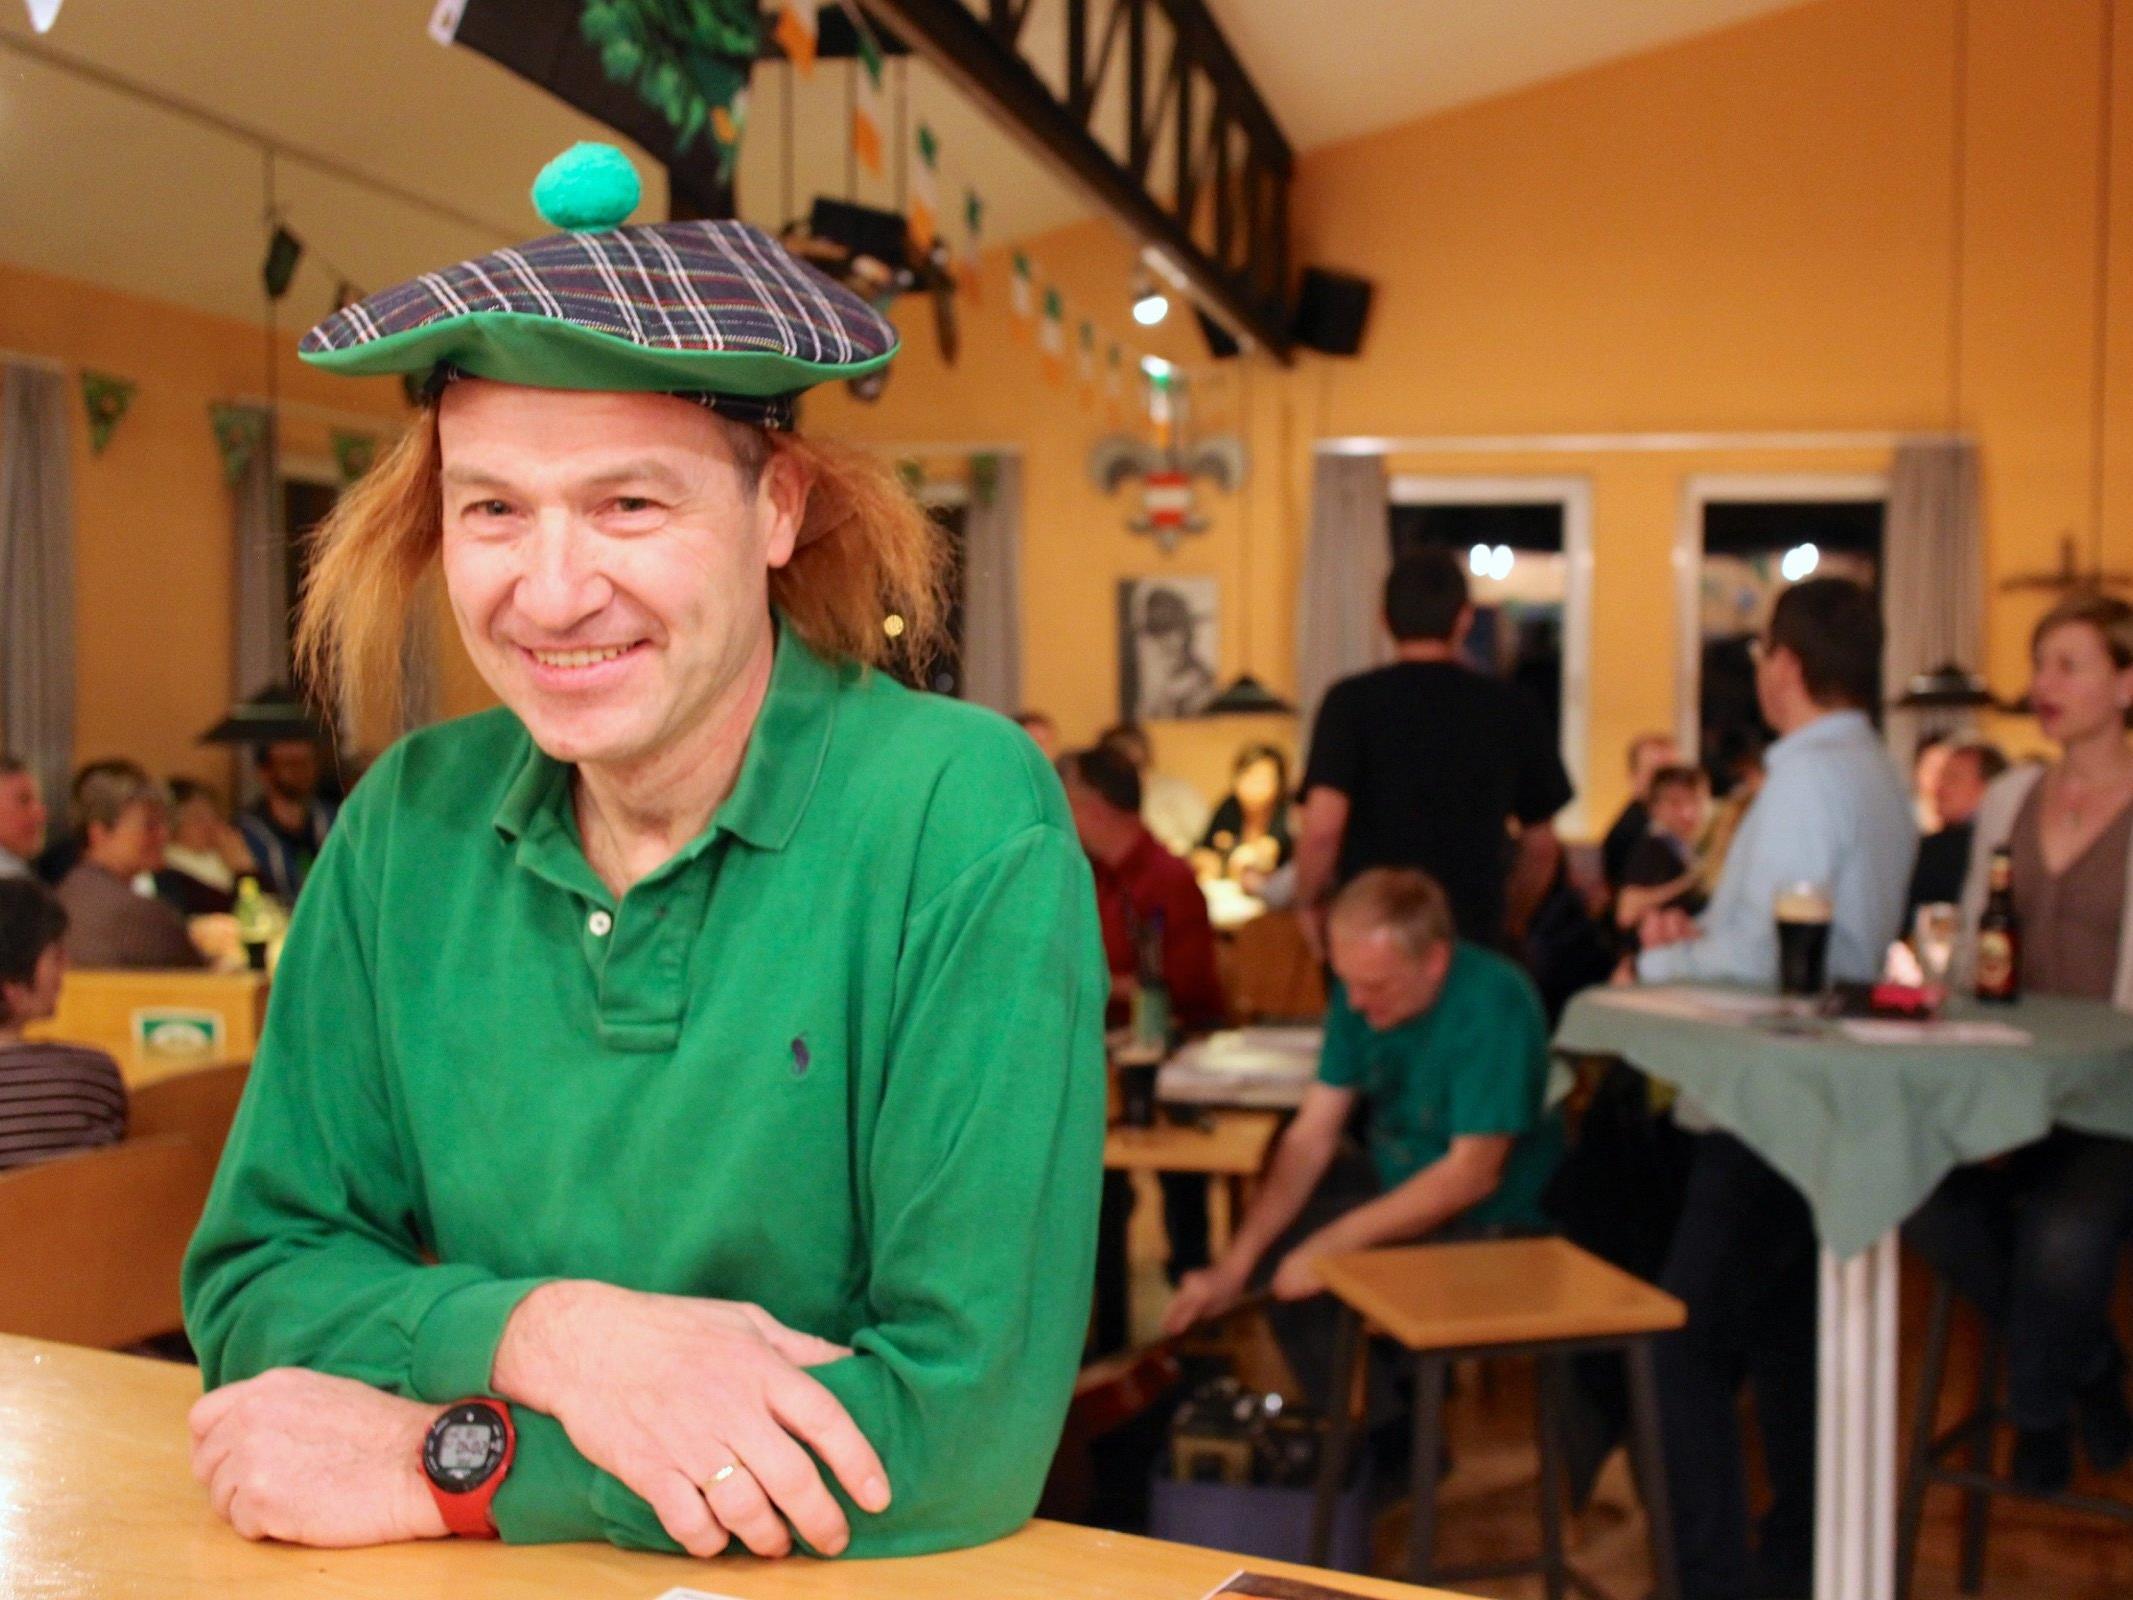 Hubert Bonner genoss den St. Patrick's Day im Pfadiclub.